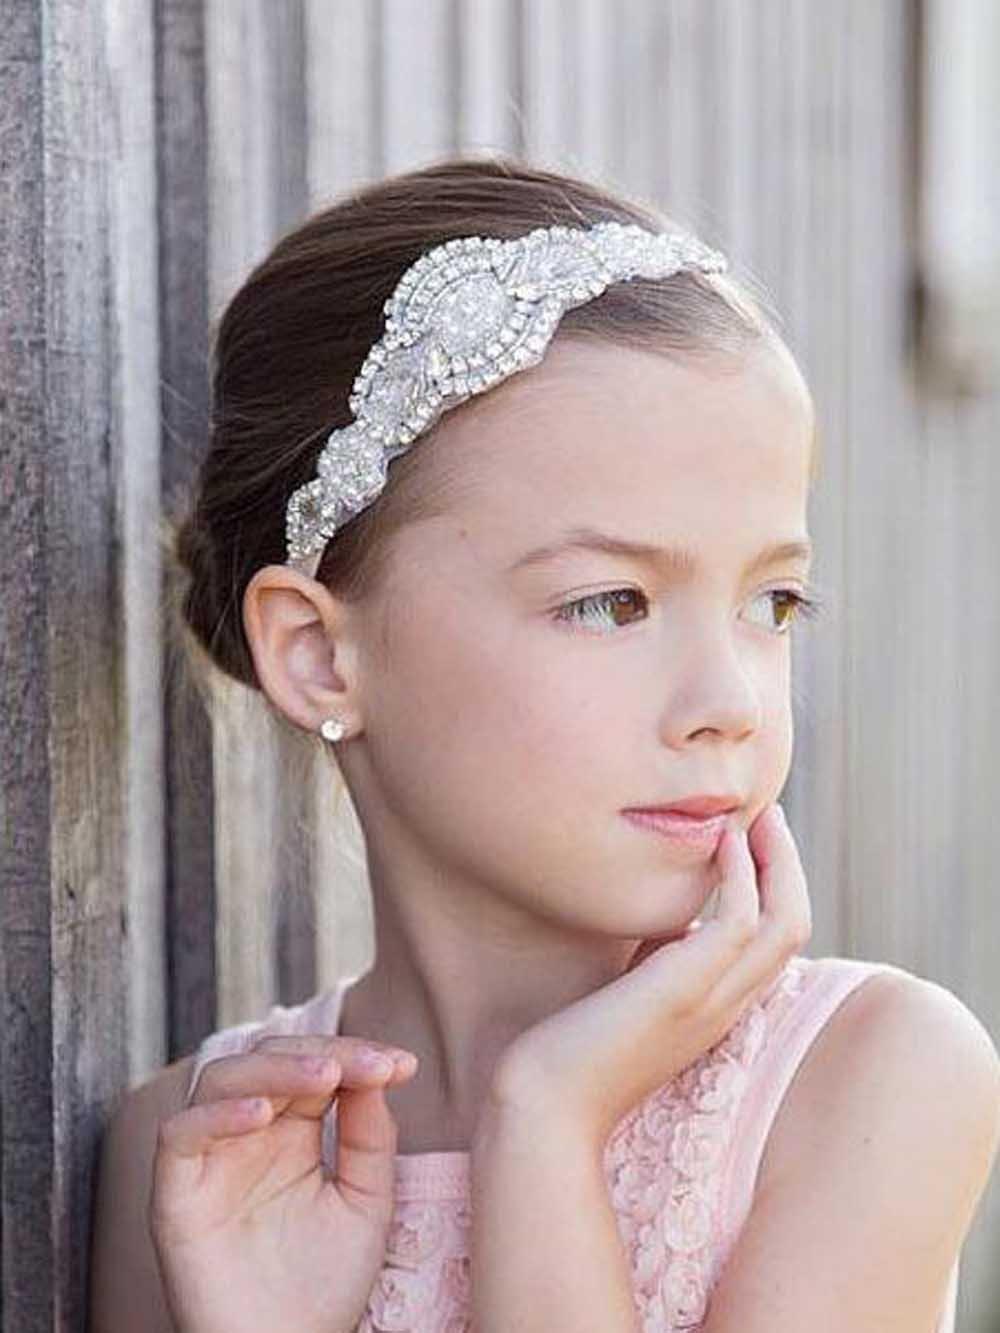 unicra flower girl headband rhinestone headband bridal headband crystal headband